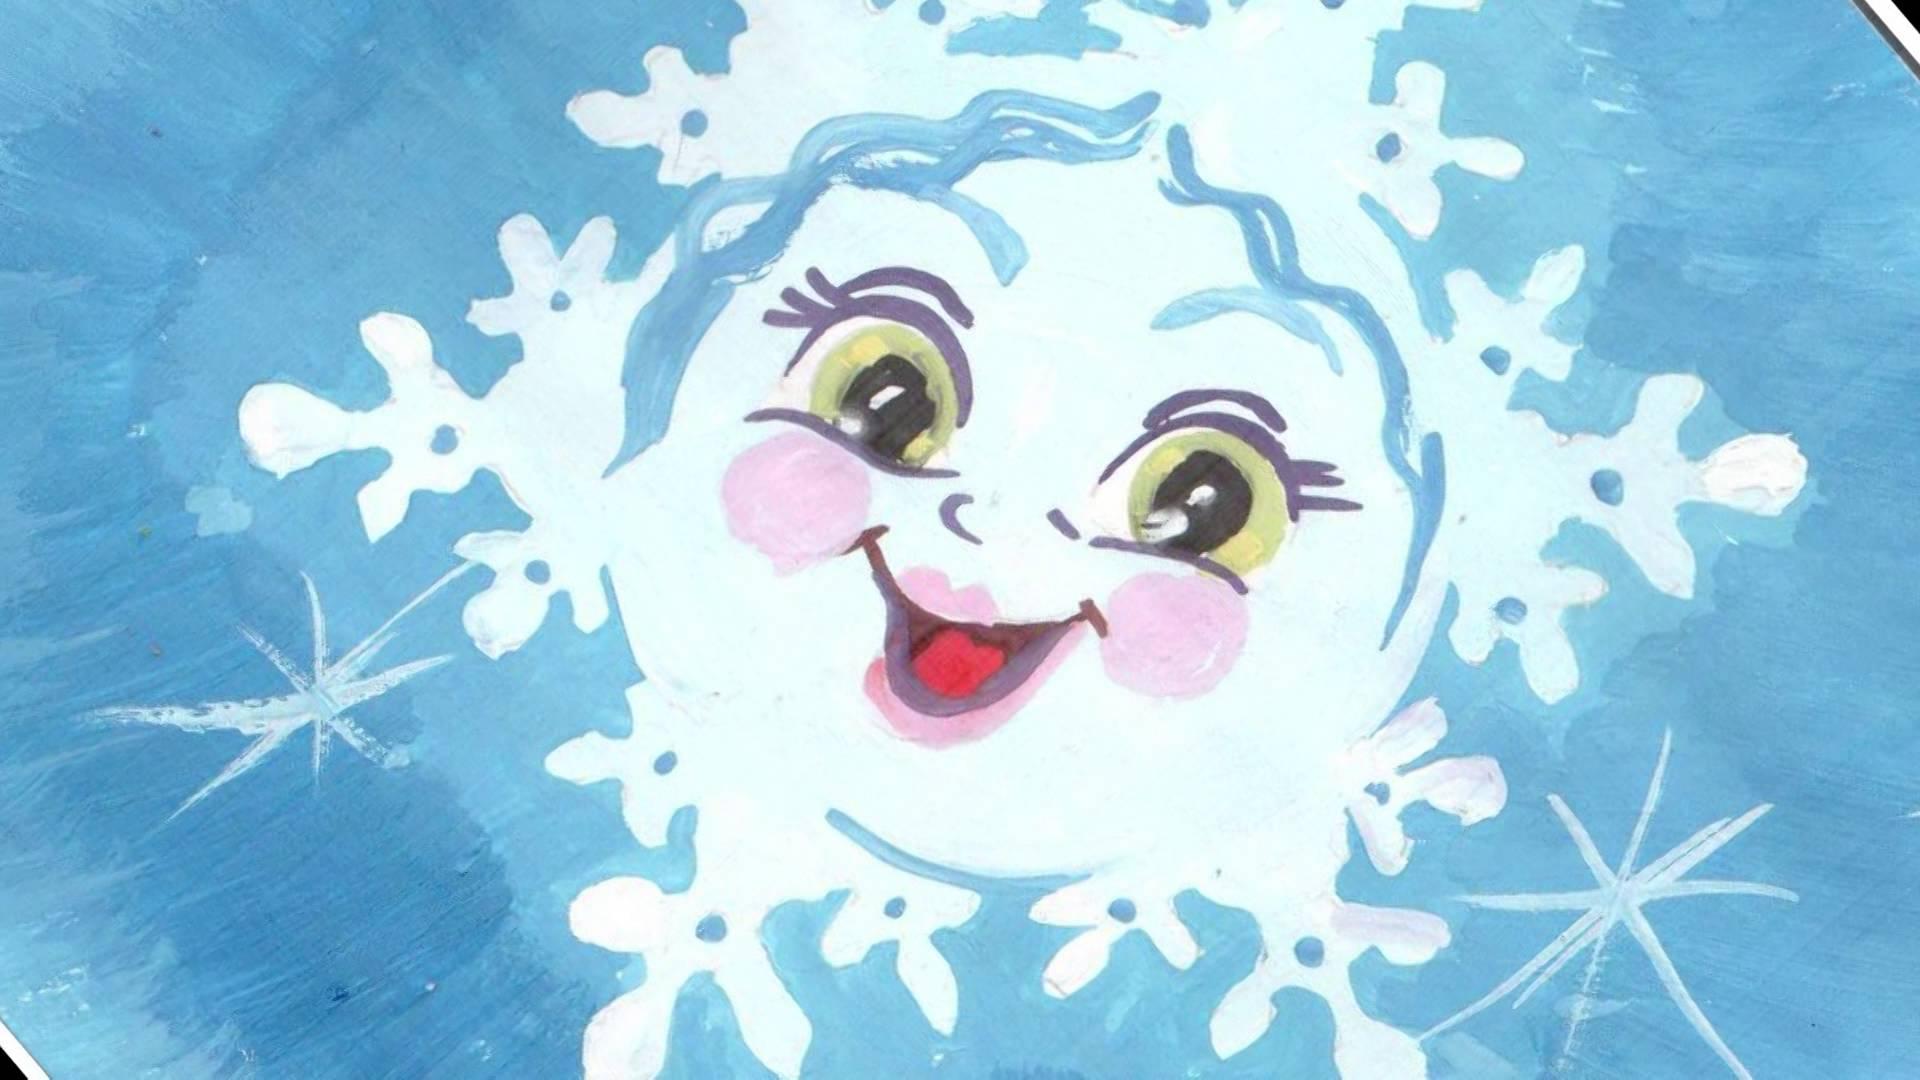 Сказка про снежинку